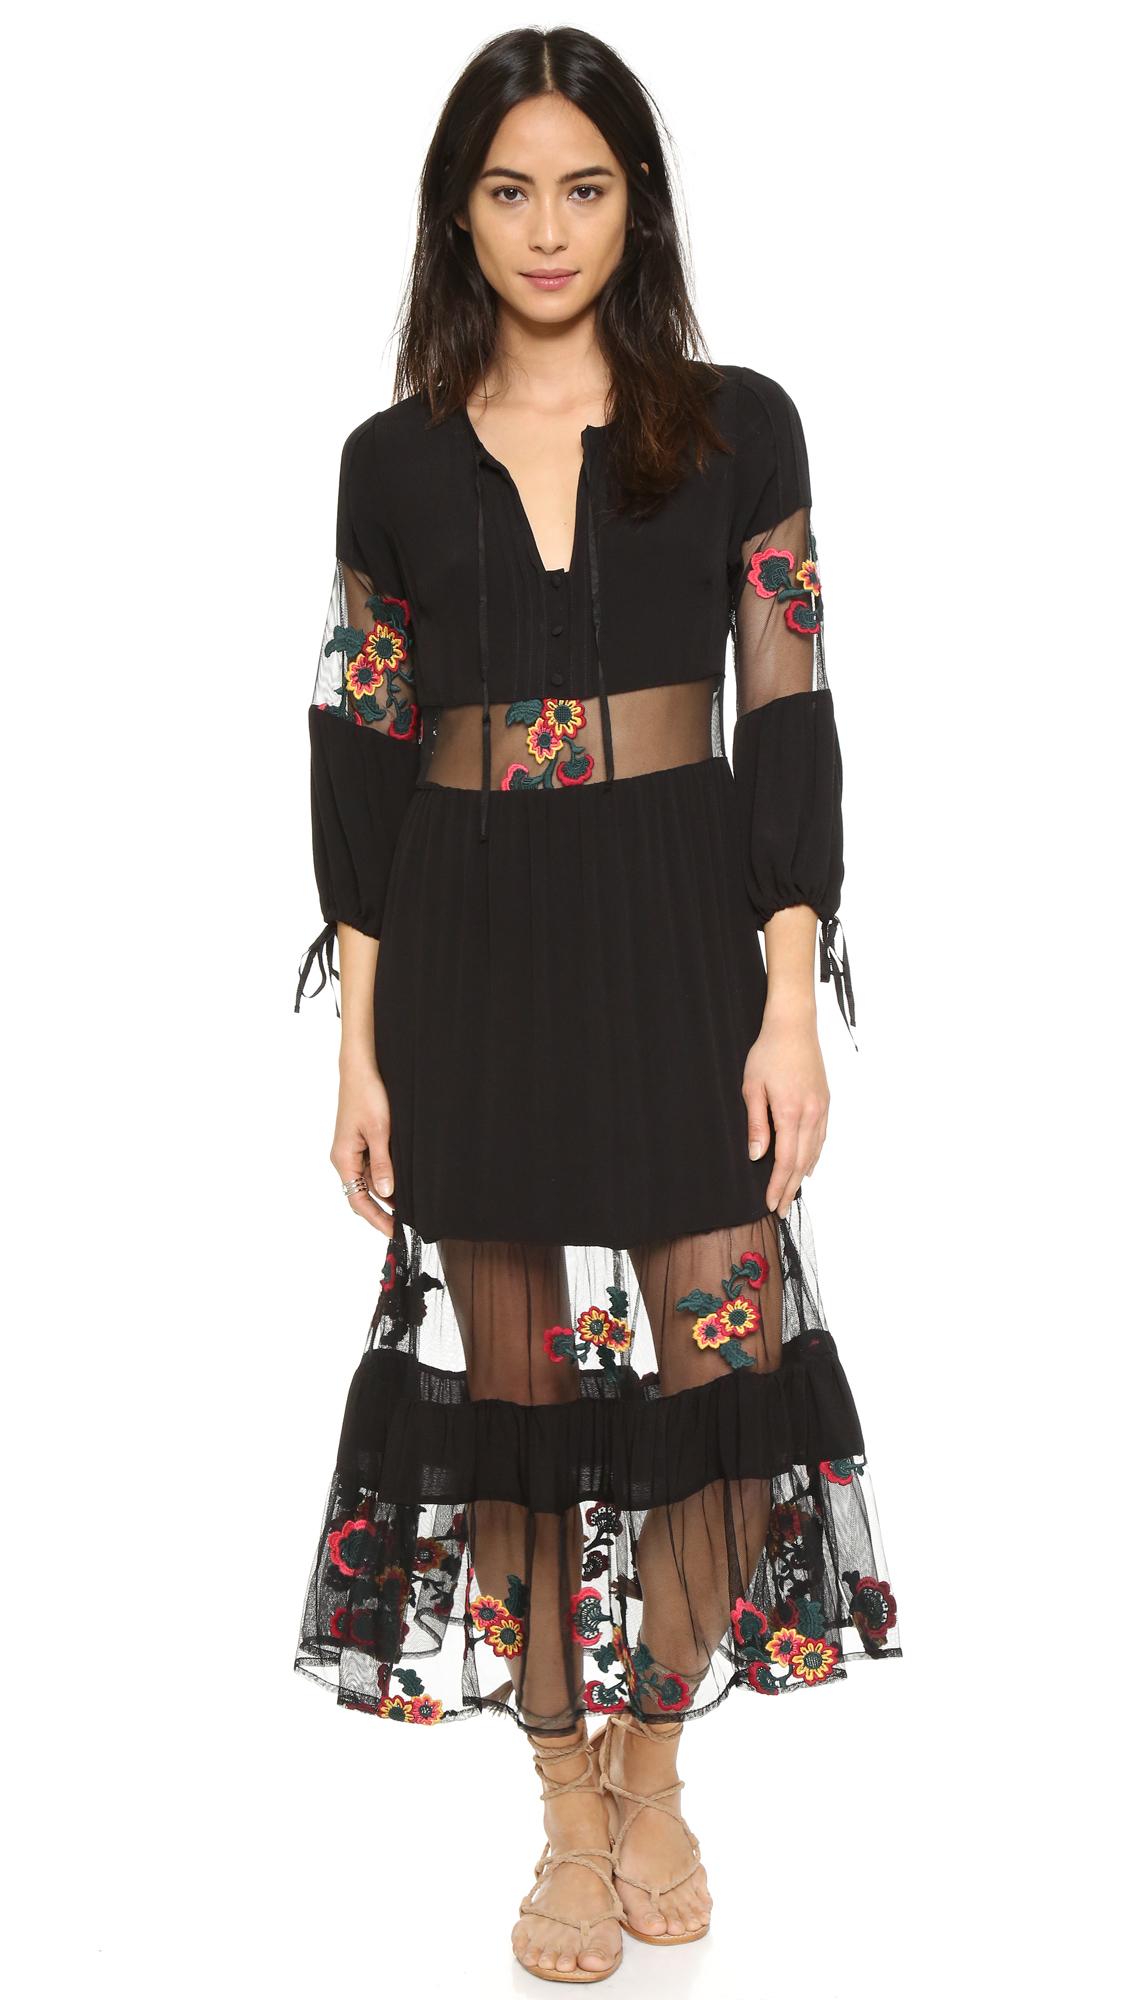 lyst for love lemons eva midi dress in black. Black Bedroom Furniture Sets. Home Design Ideas